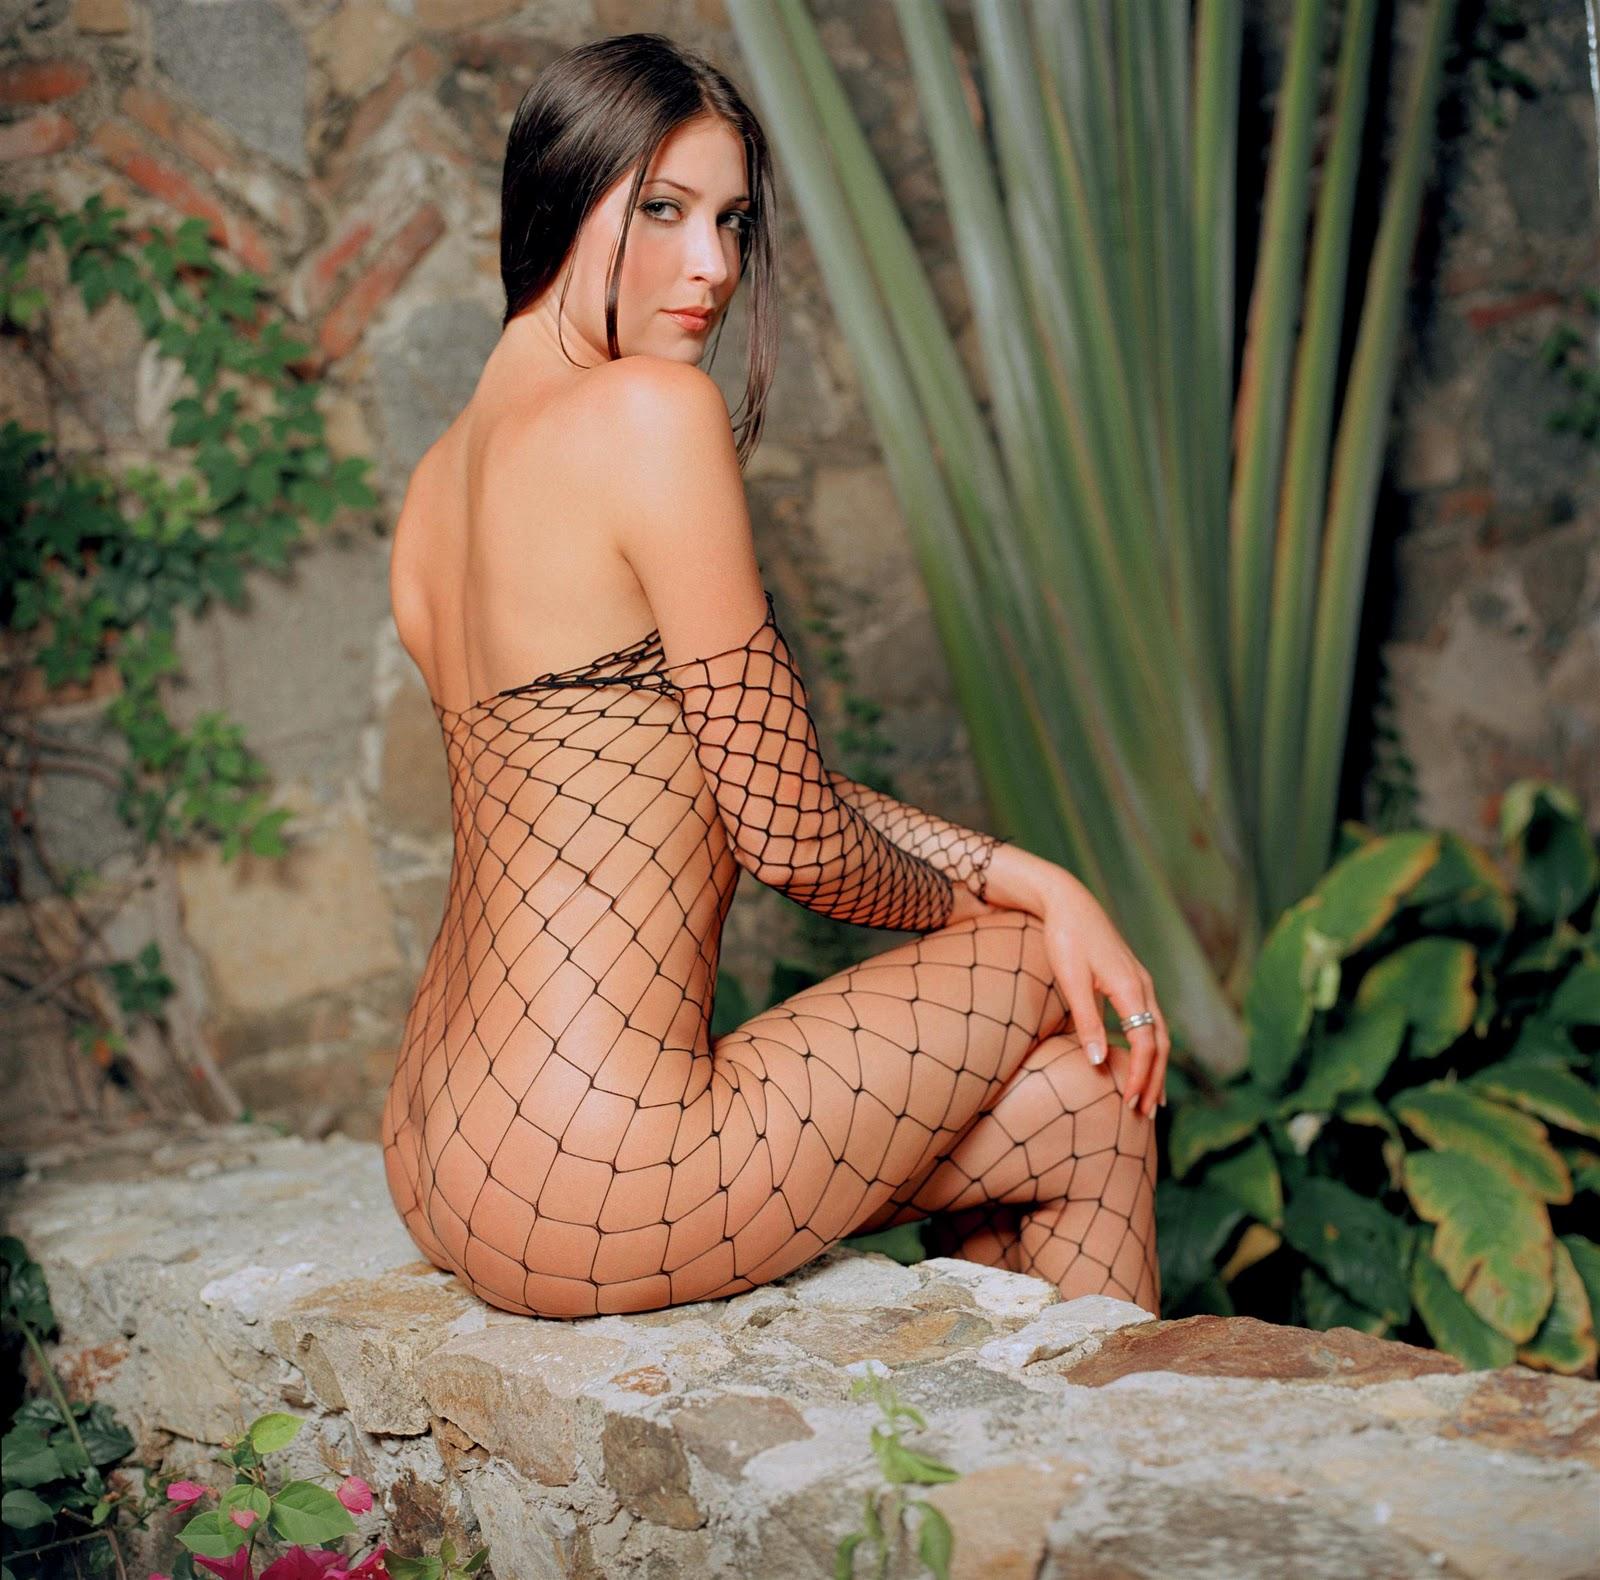 Hot Lisa Snowdon Topless - Sex Porn Images